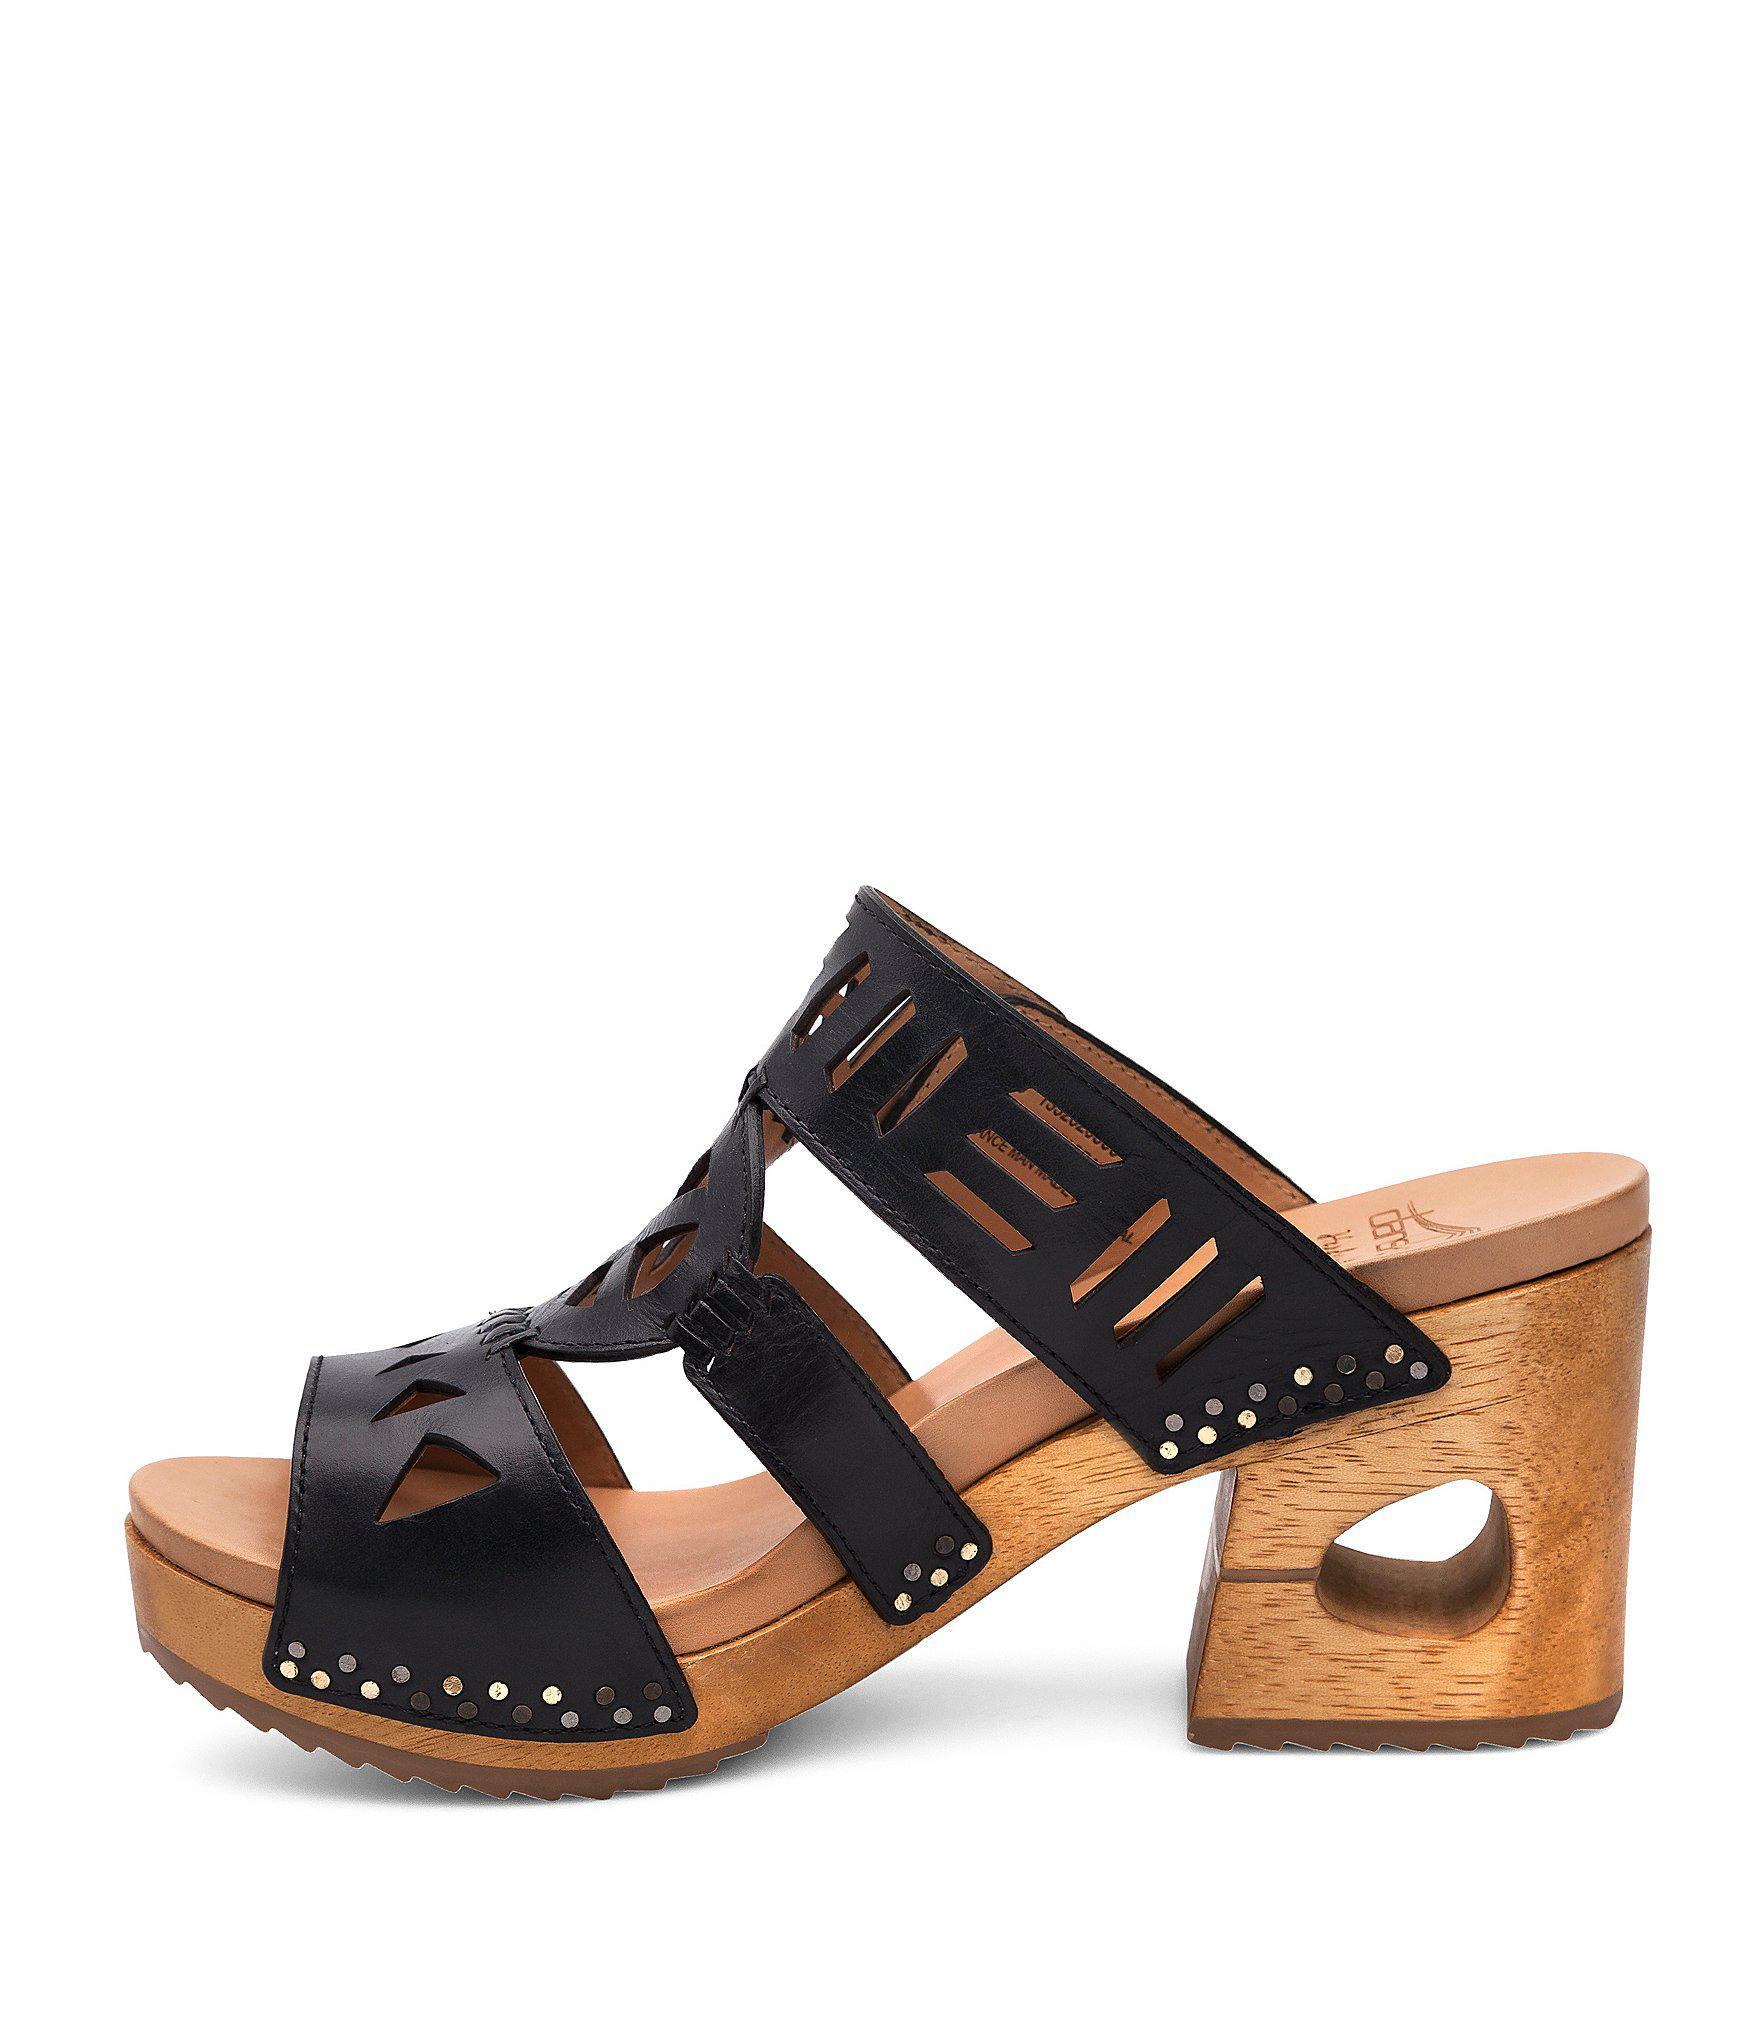 f54aeeb7d401 Lyst - Dansko Oralee Black Waxy Block Heel Sandals in Black